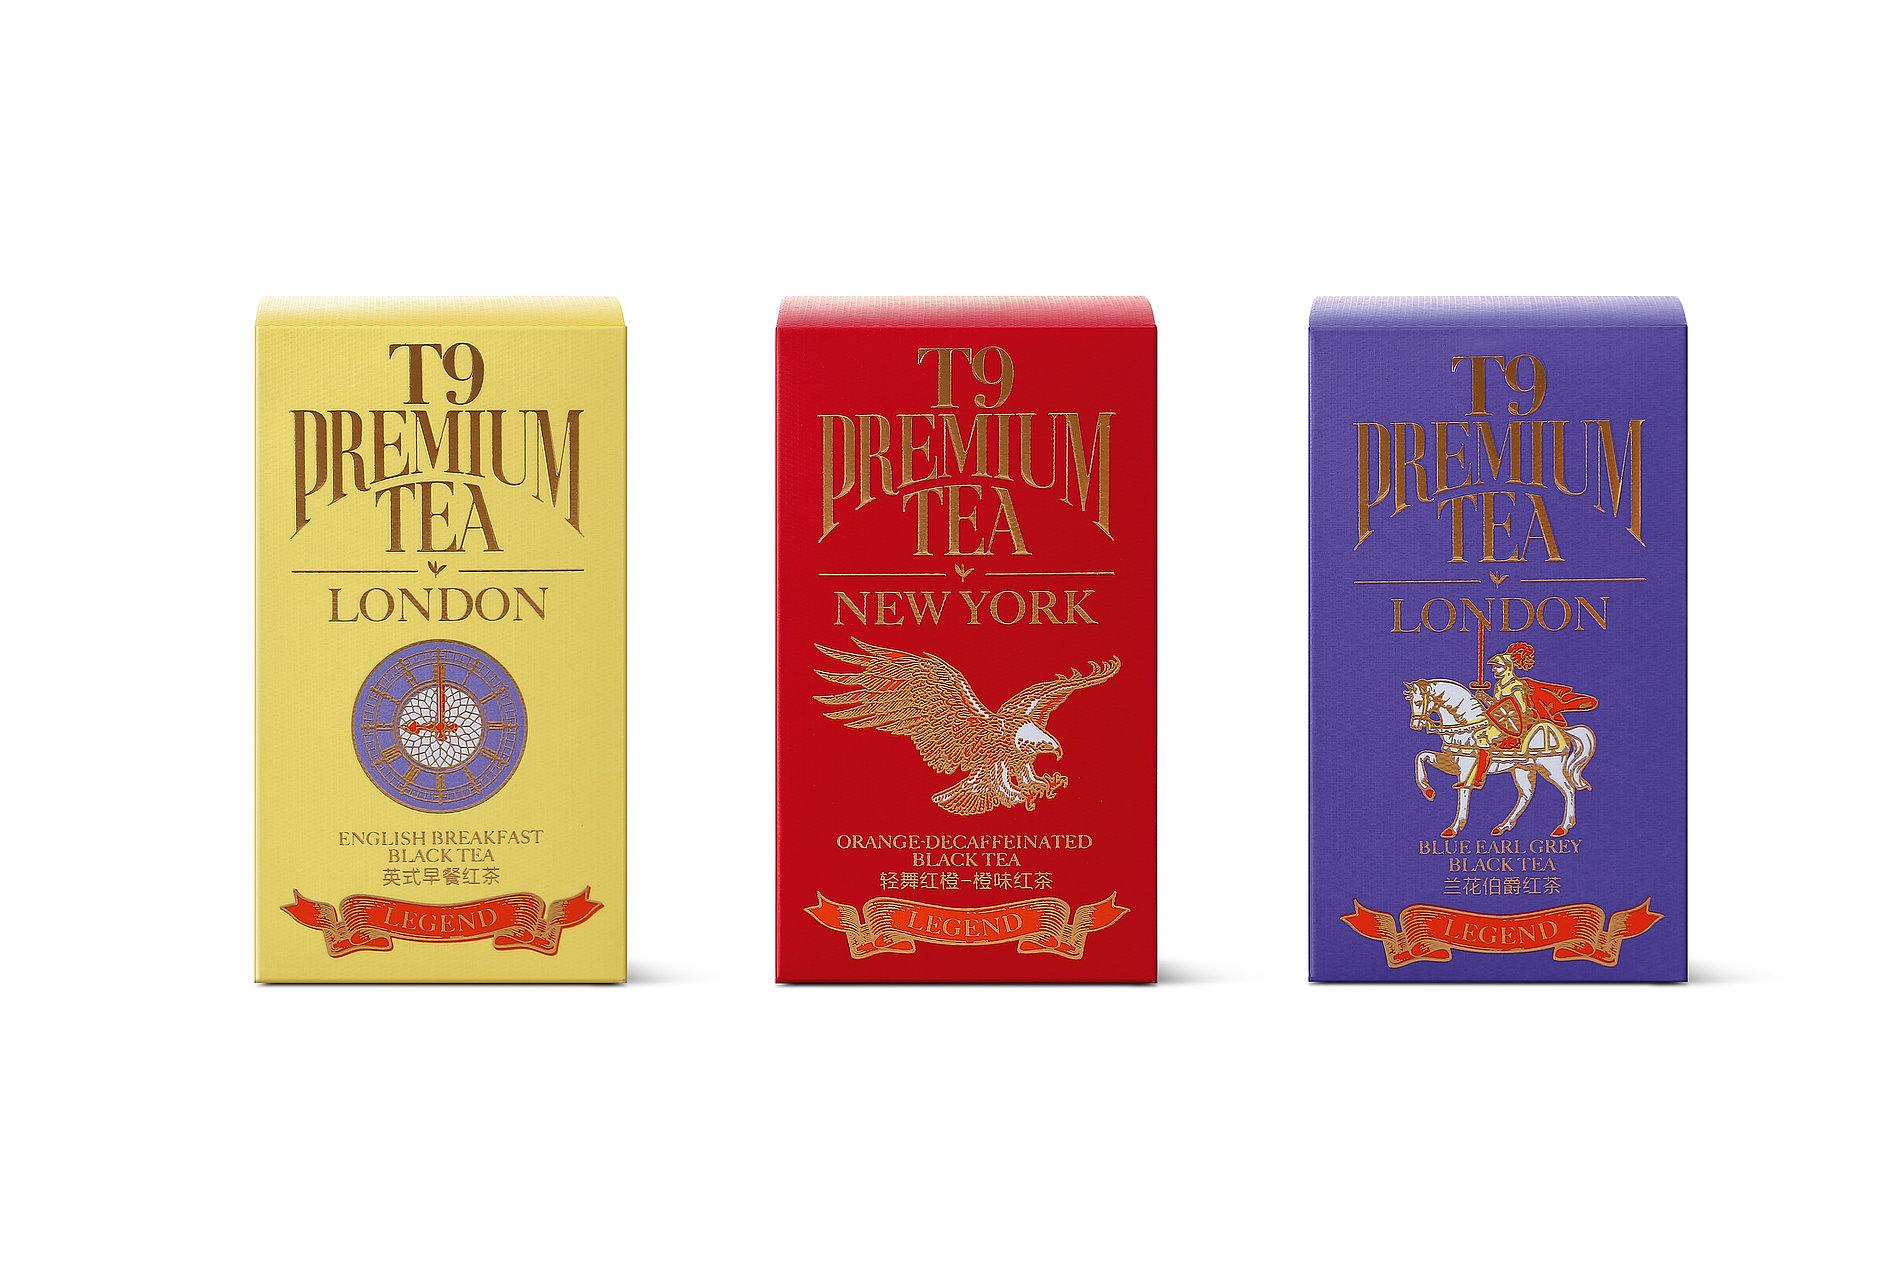 T9 Premium Tea Legend Collection   Red Dot Design Award